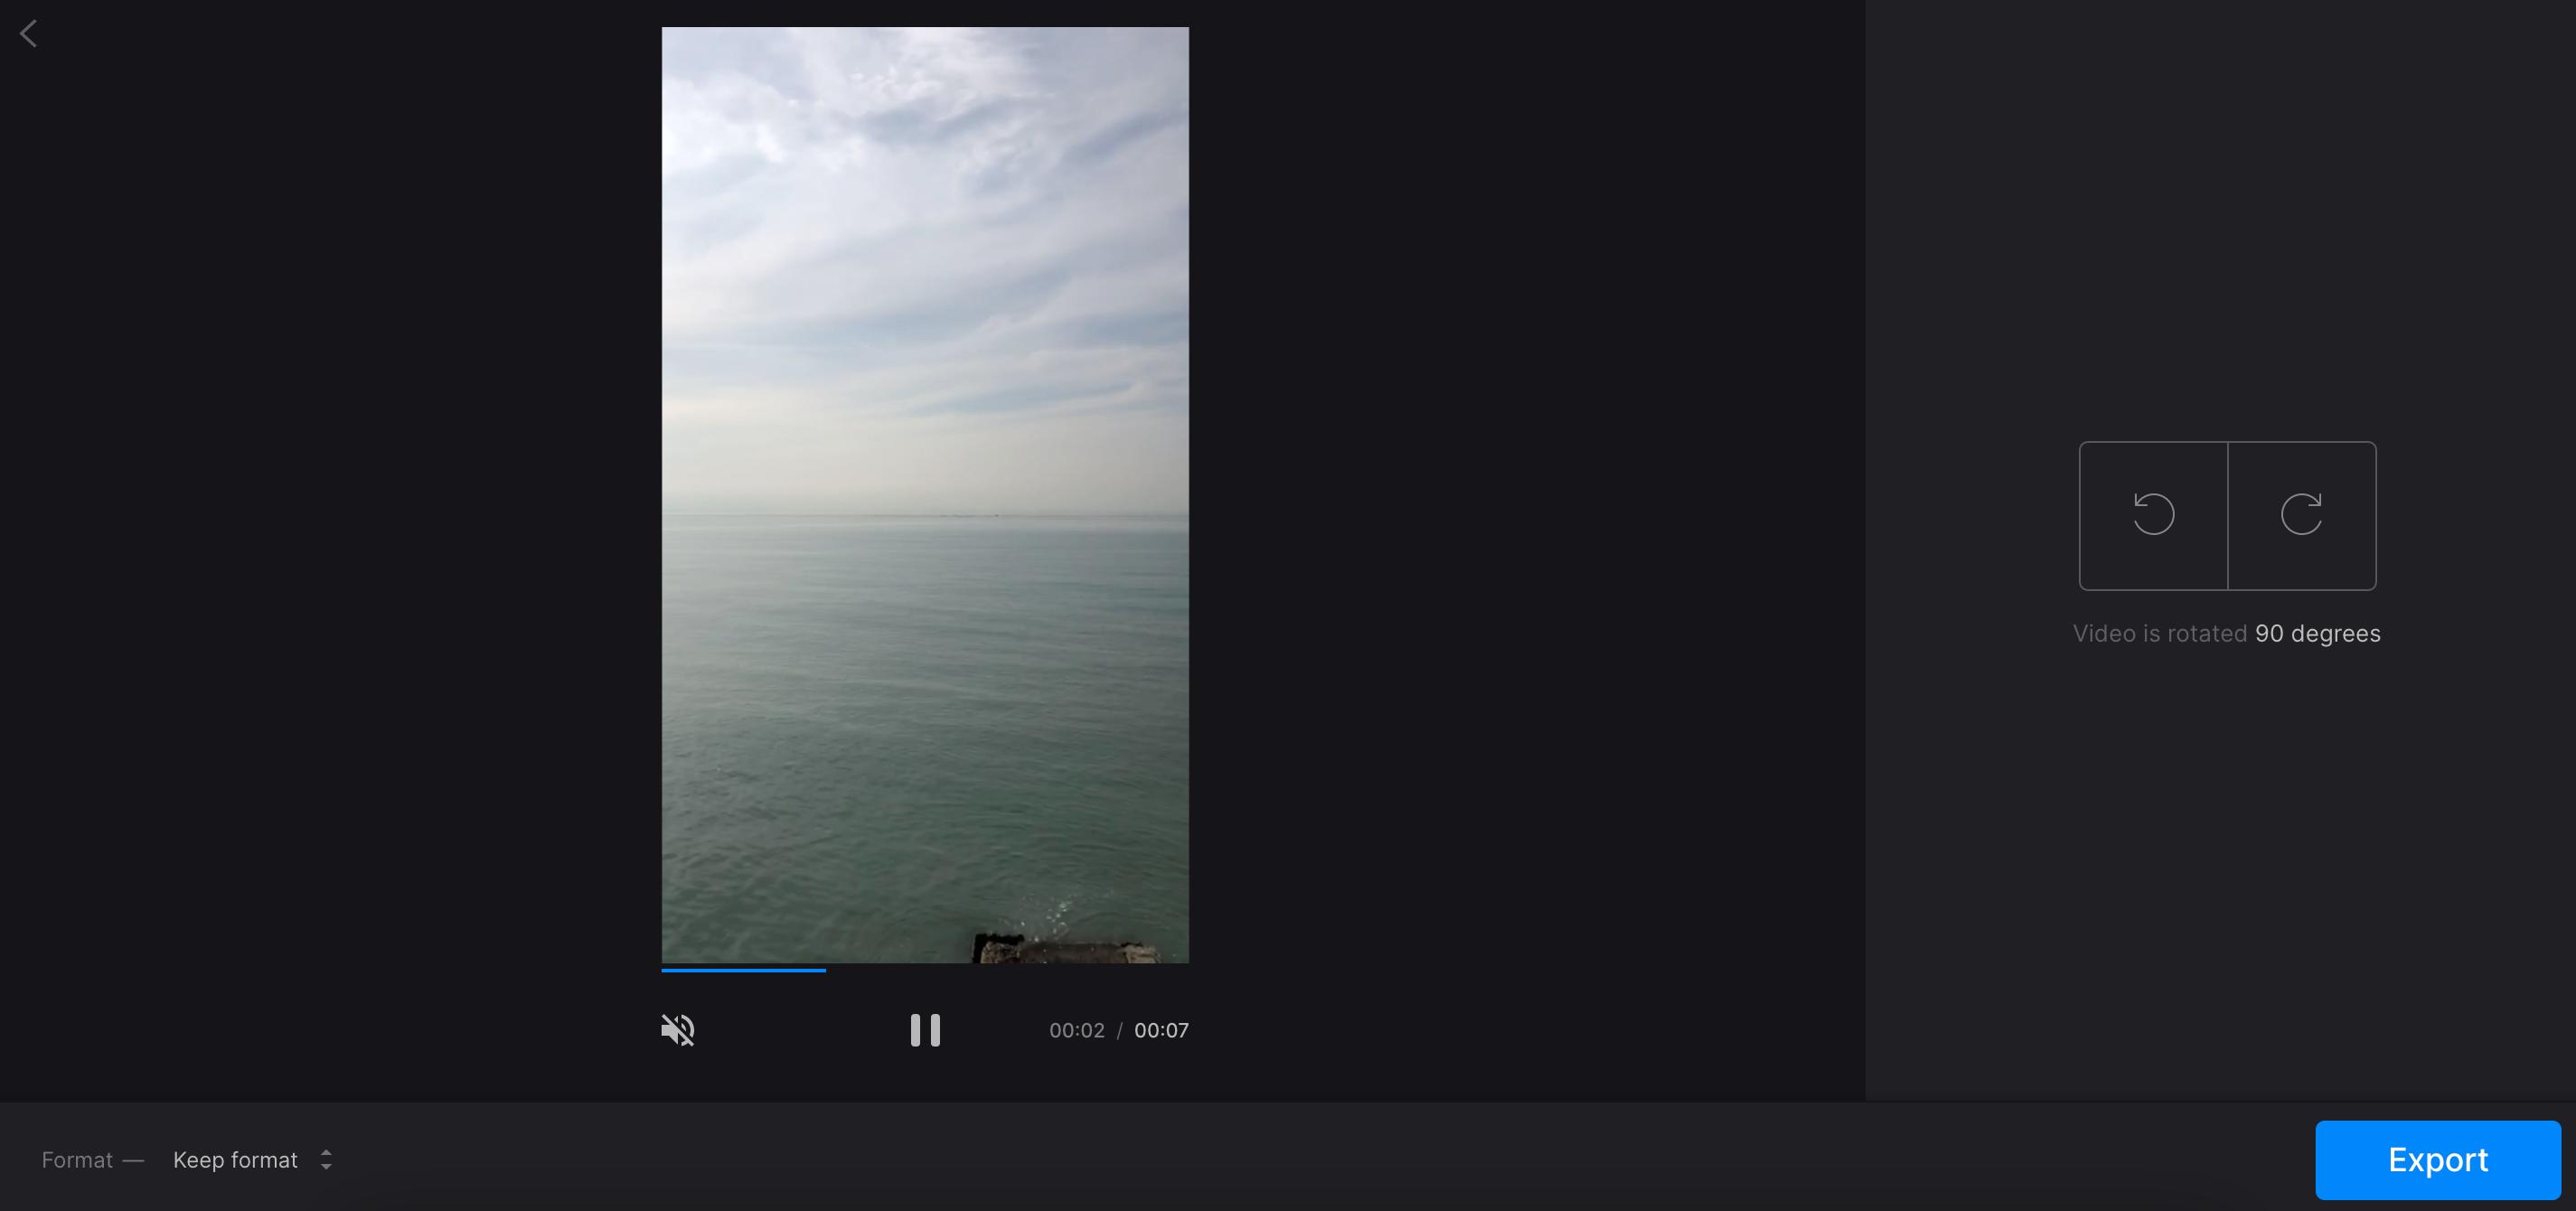 Rotate vertical video to make it horizontal